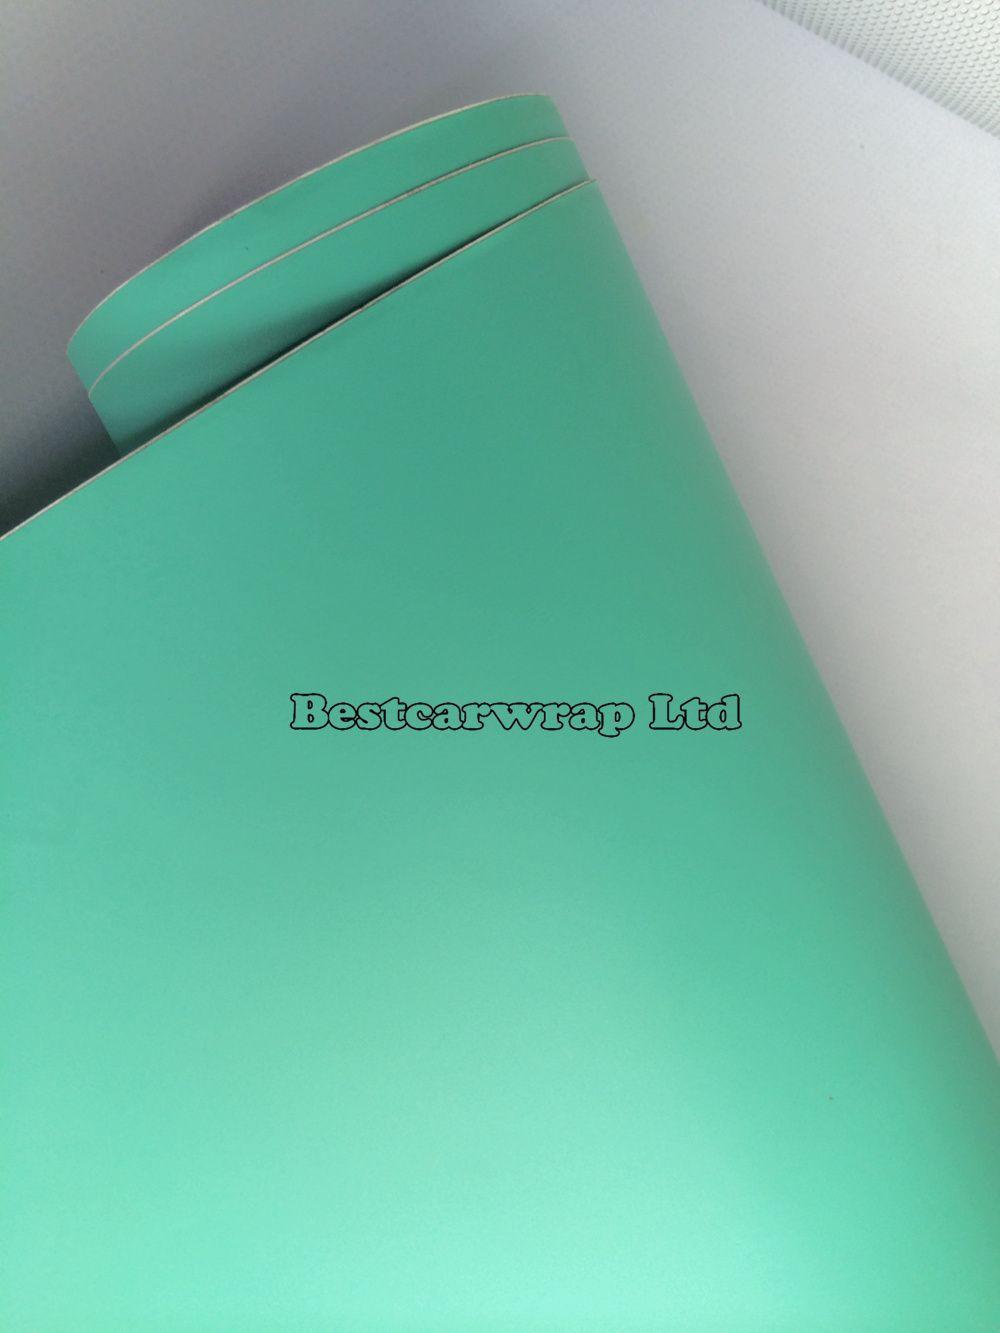 Premium Matt Tiffany Blue Vinyl Car Wrapping Film With Air Bubble Free Mint Matte Film Wrap covers foil 1.52x30m/Roll 5x98ft